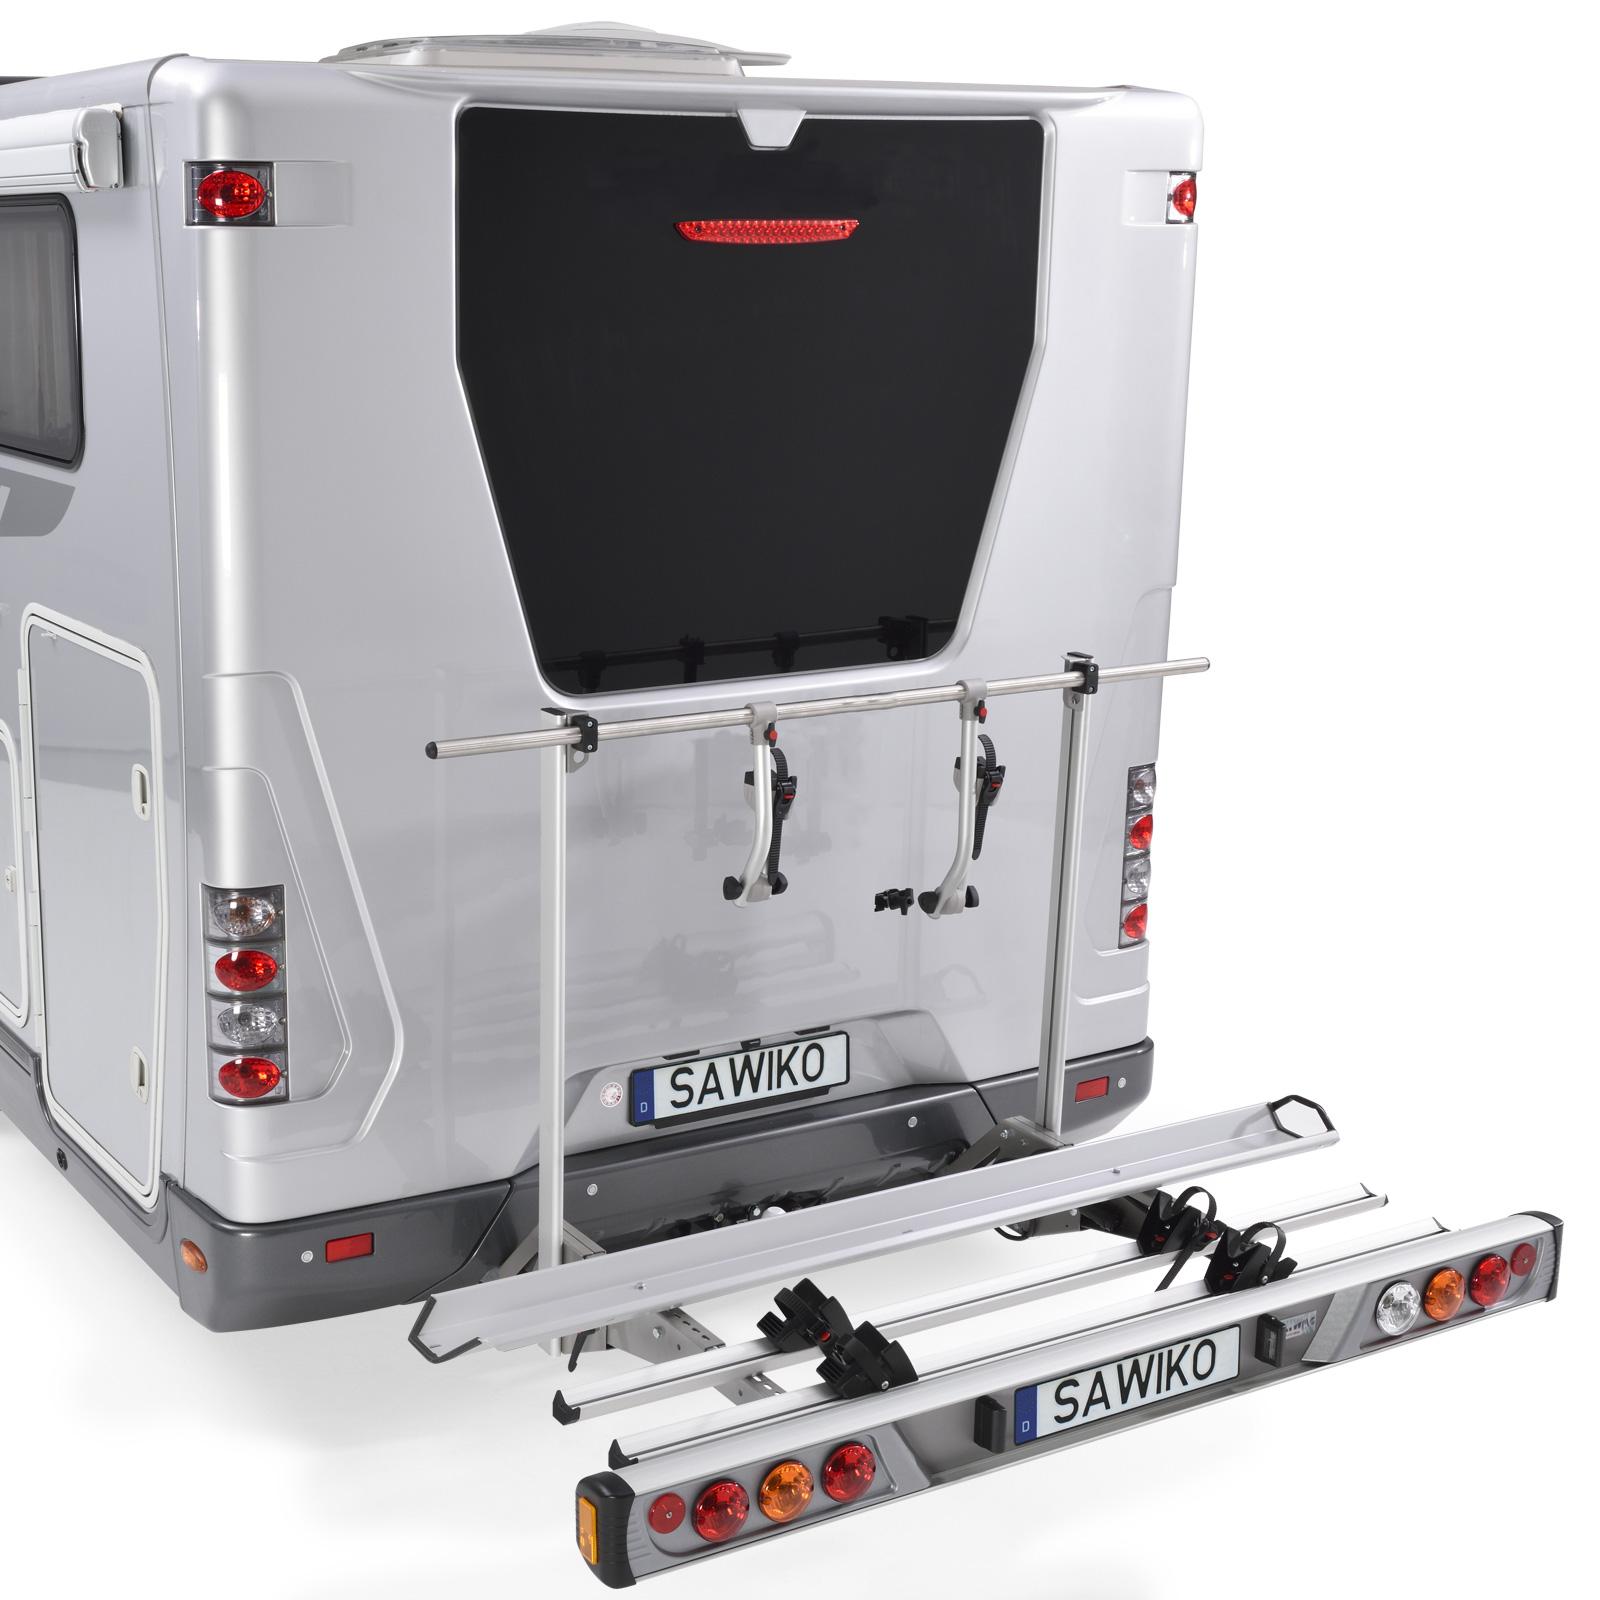 SAWIKO Lastenträger VARIO 1 Roller Premium